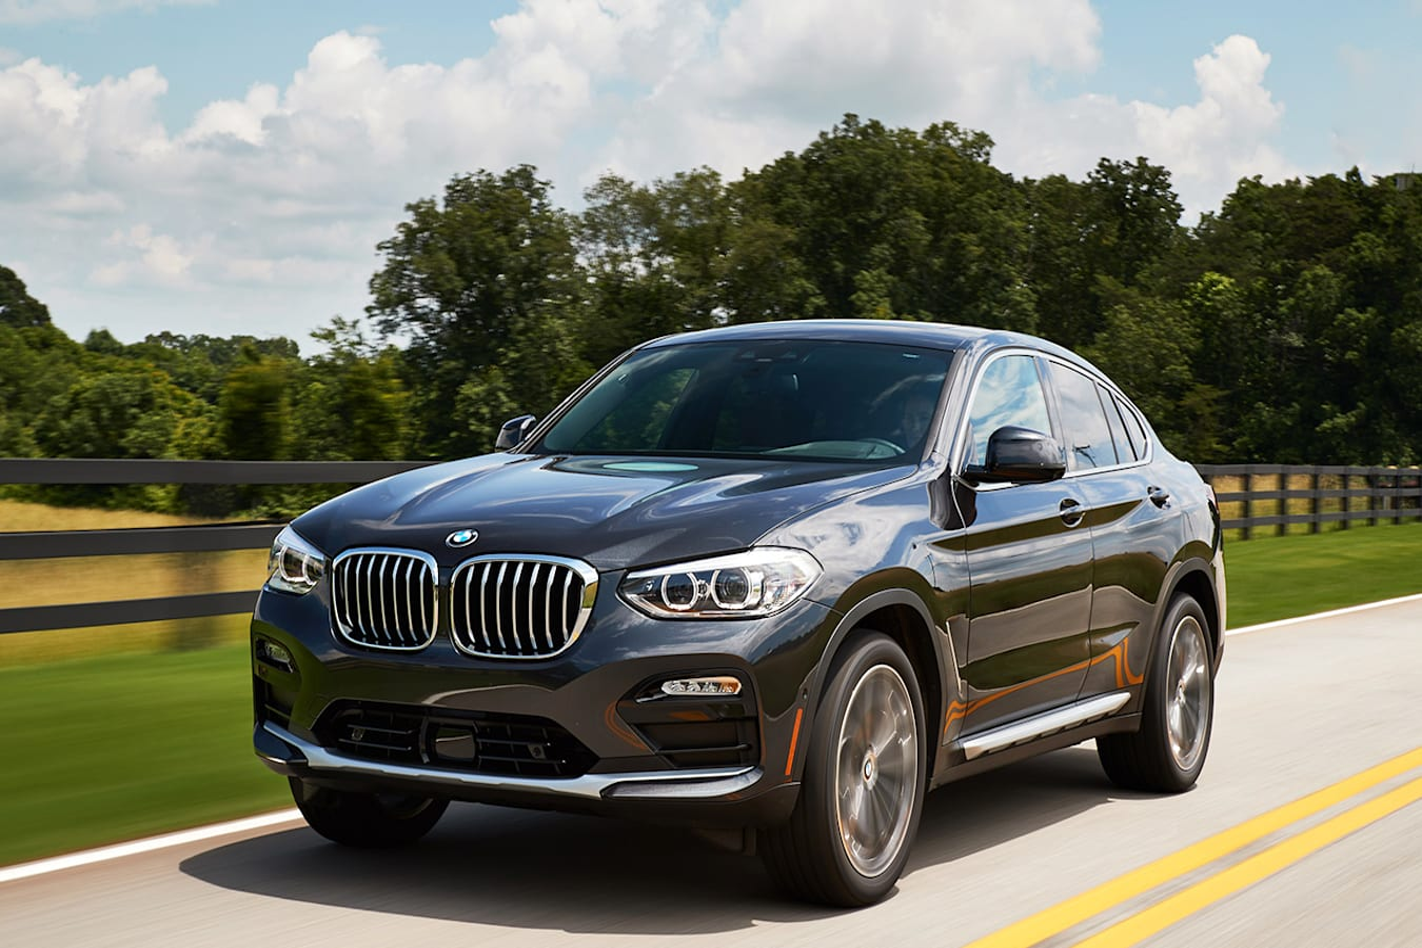 2019 BMW X4 front